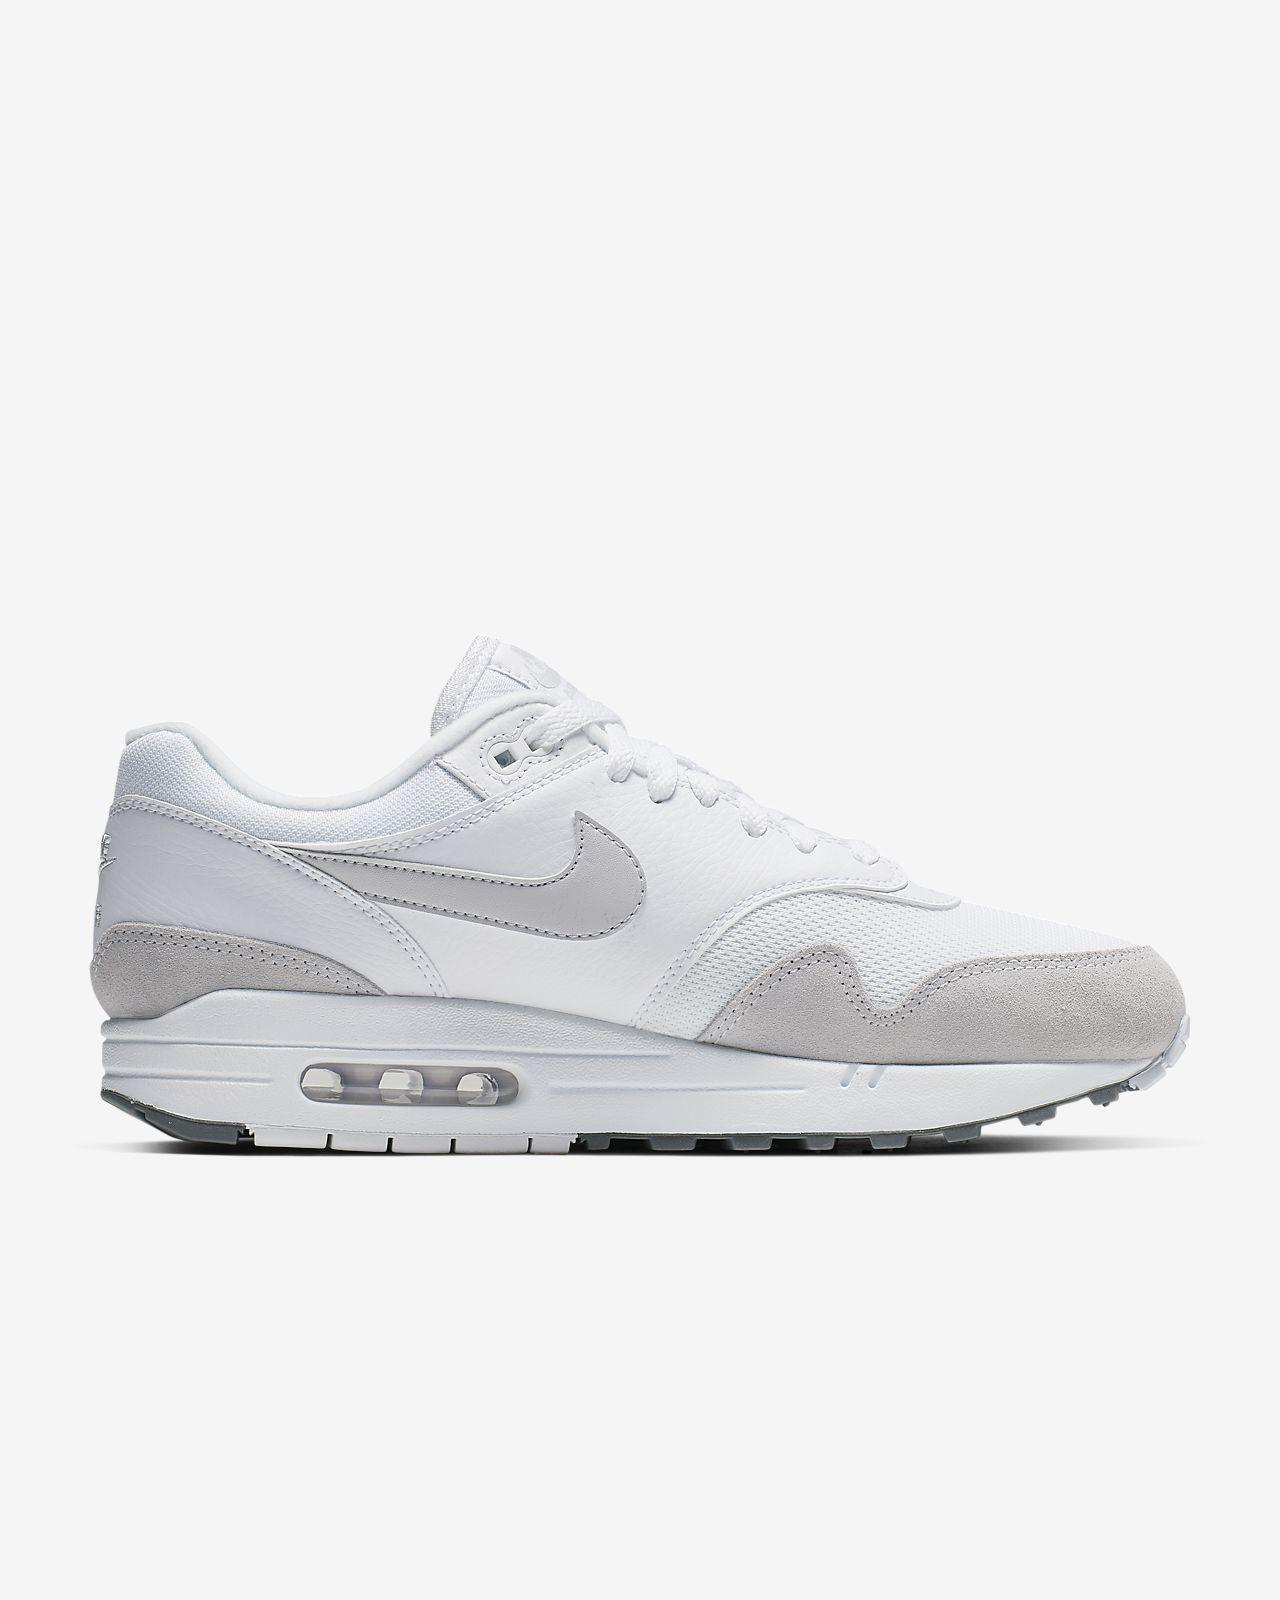 on sale 8e22d 68c8d Nike Air Max 1 Men's Shoe. Nike.com SE